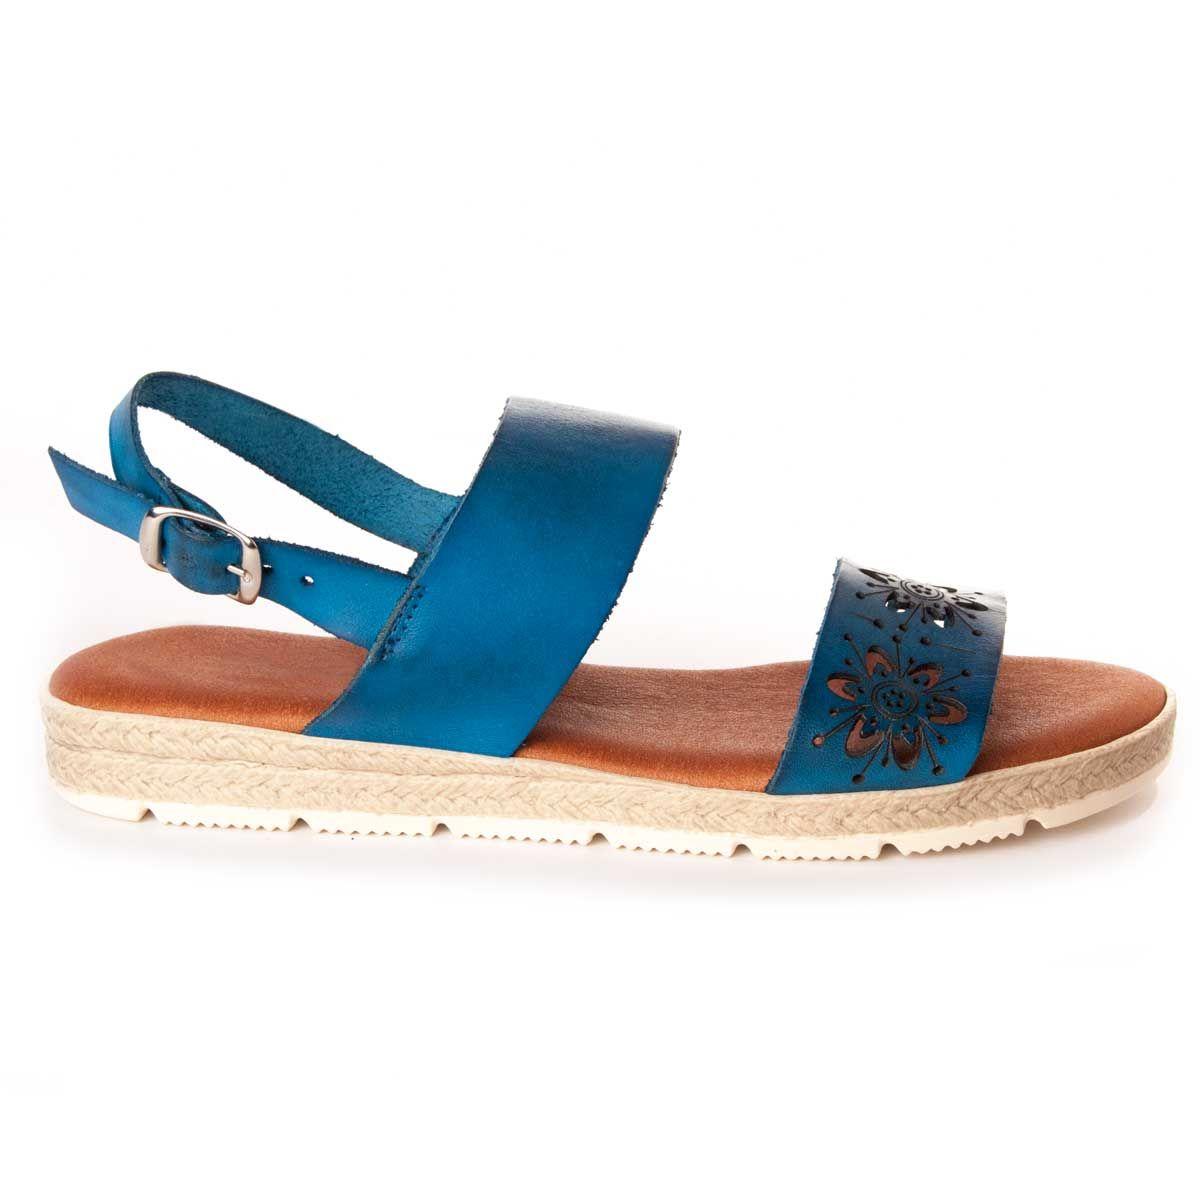 Montevita Double Strap Flat Sandal in Blue